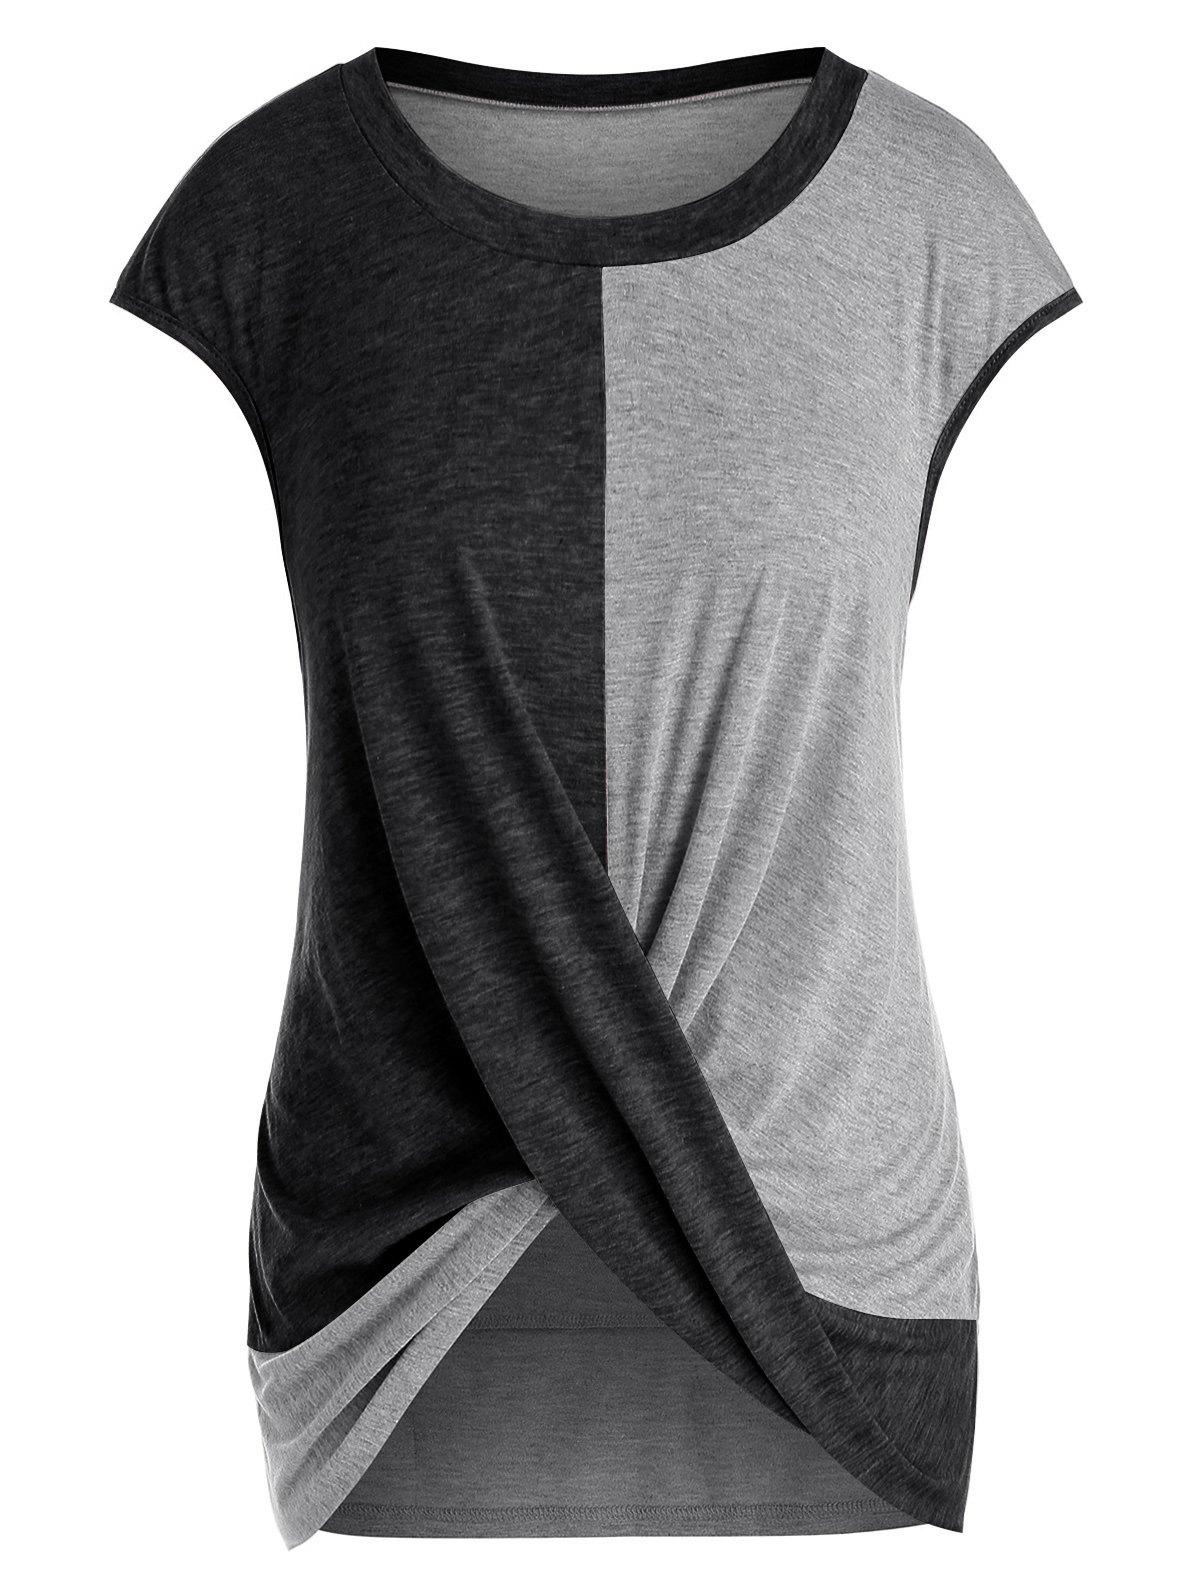 Plus Size Cap Sleeve Criss Cross T-shirt